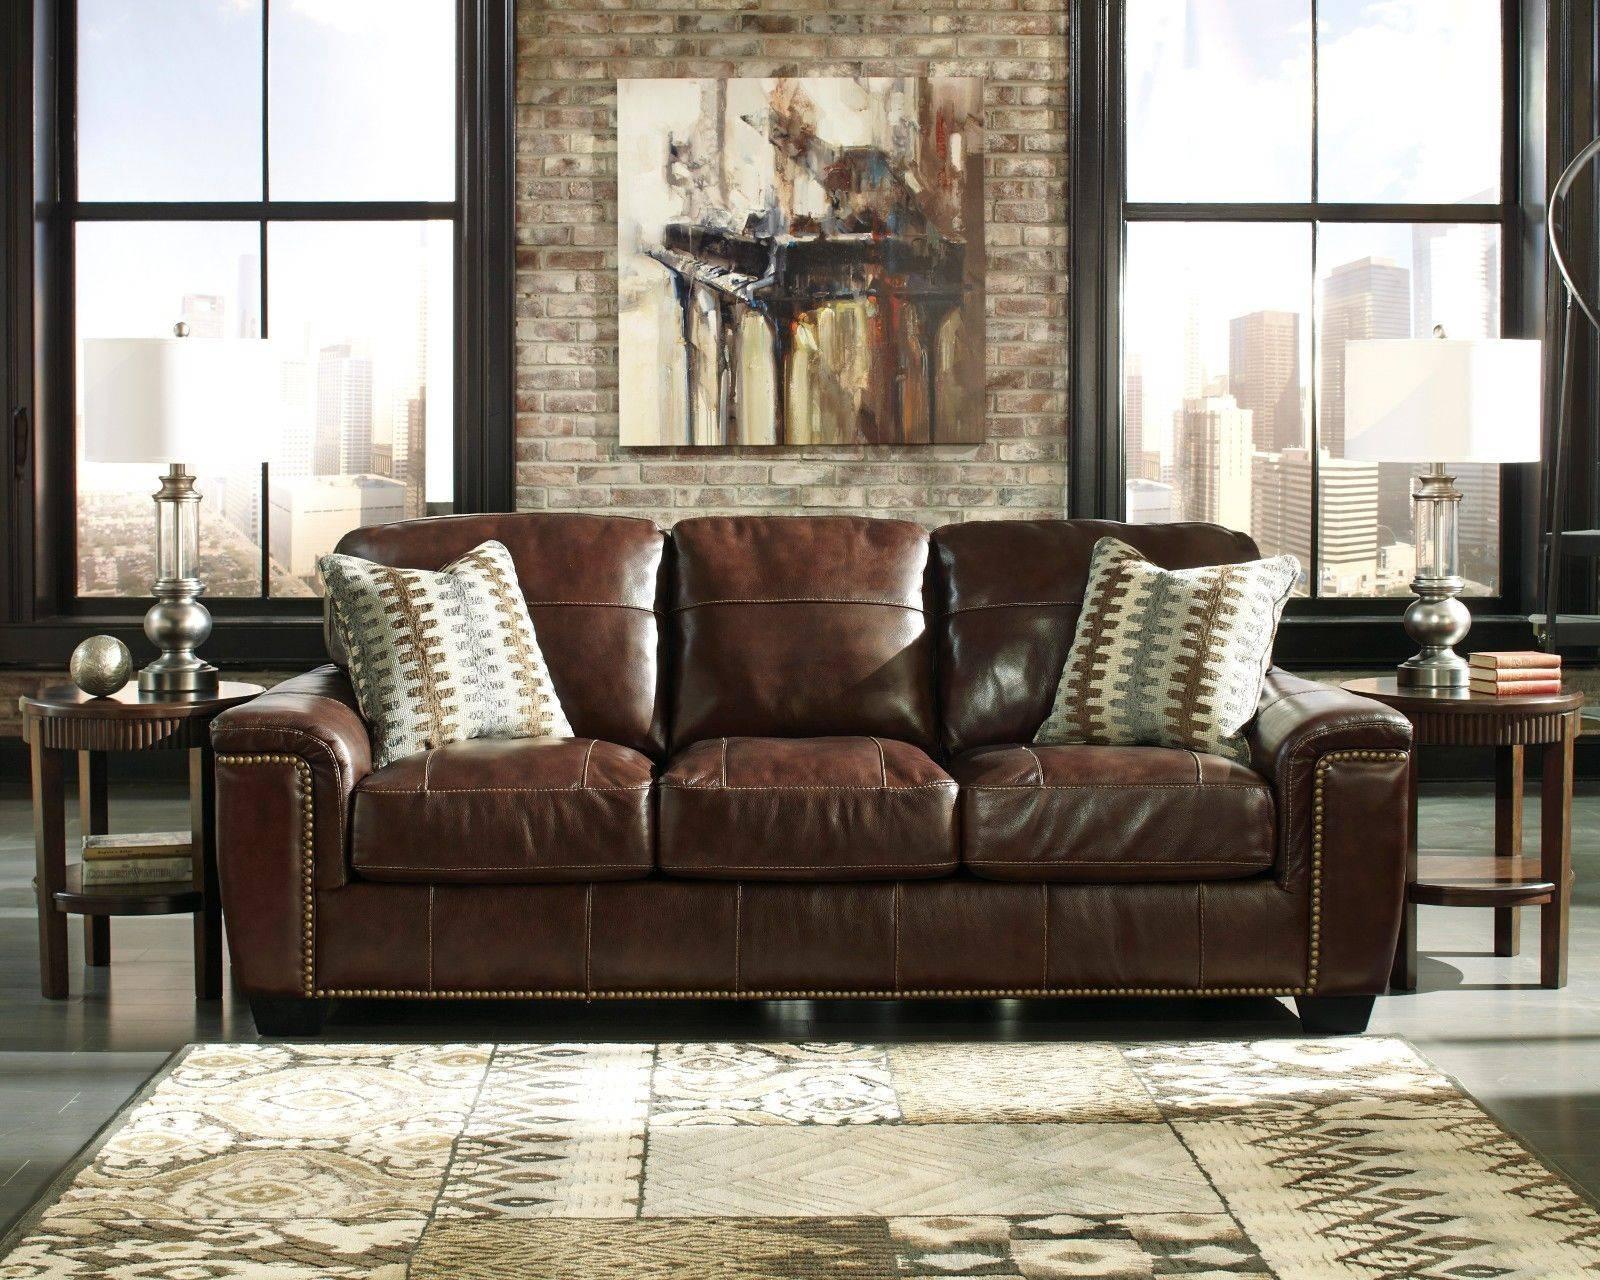 Full Grain Leather Sofa Ideas | Porch & Living Room for Full Grain Leather Sofas (Image 10 of 30)